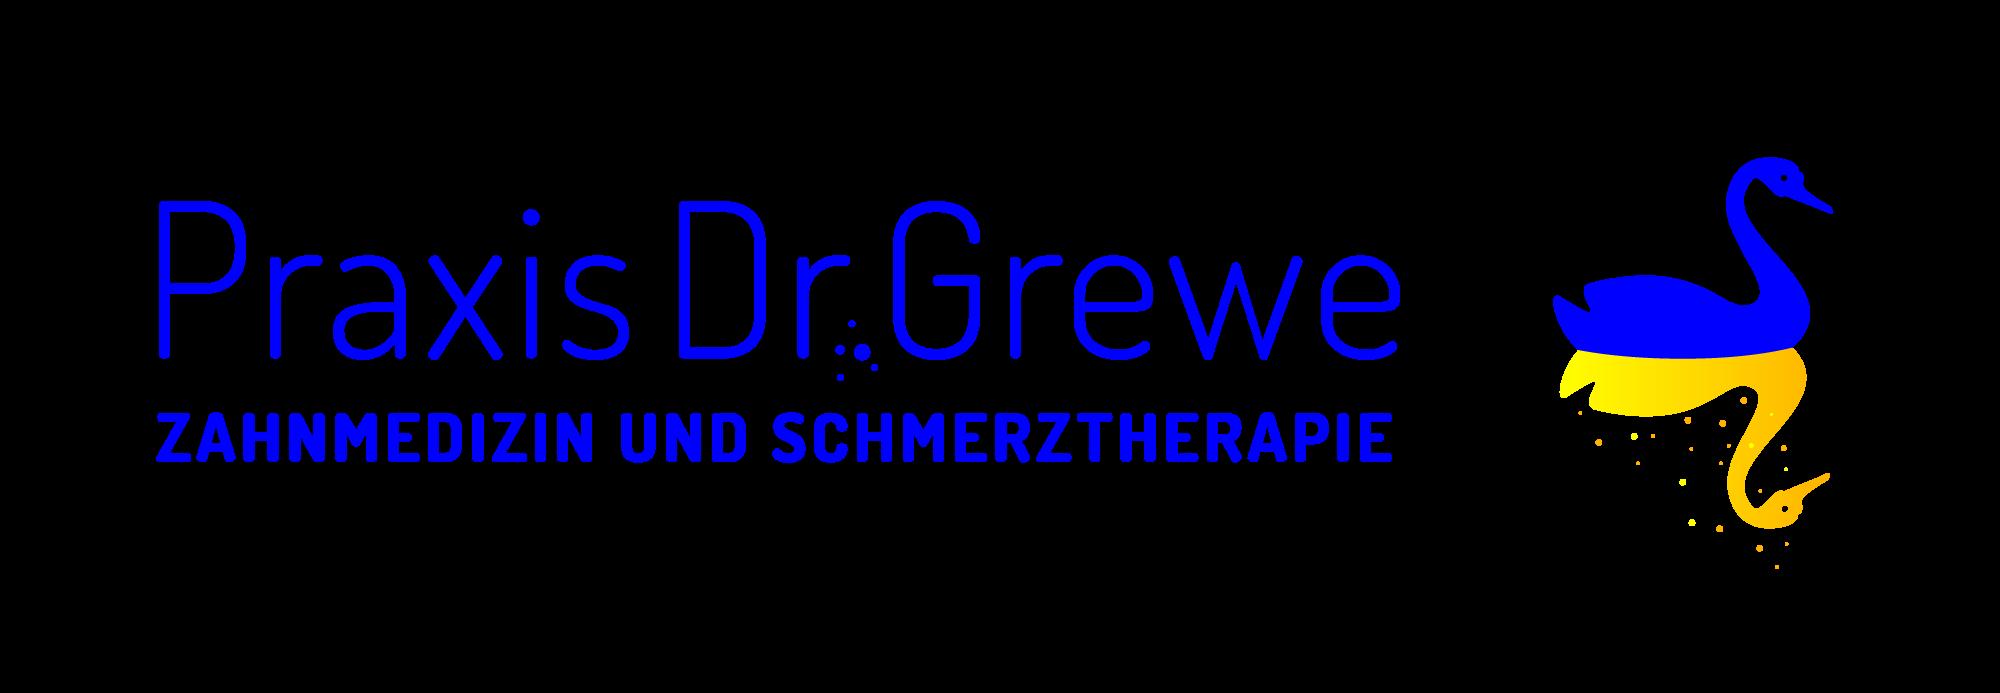 CMD Köln - Dr. Peter Grewe Logo